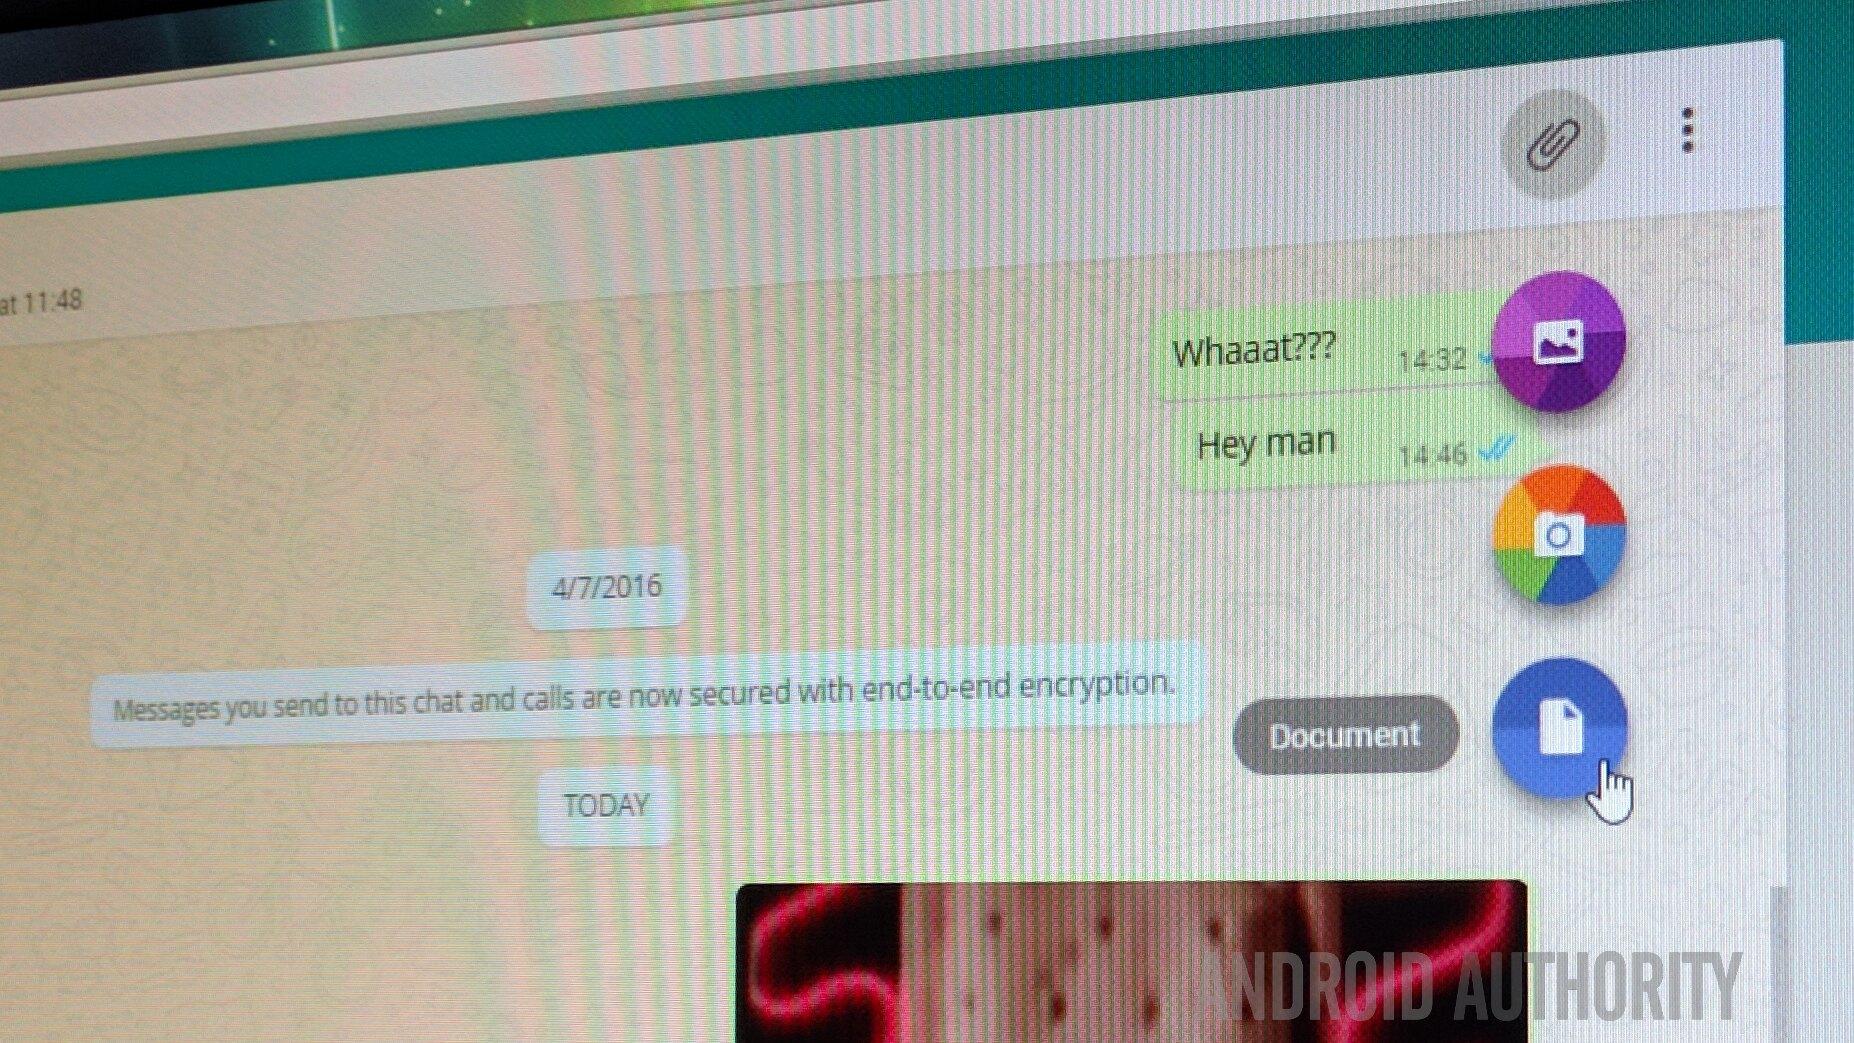 whatsapp web documents